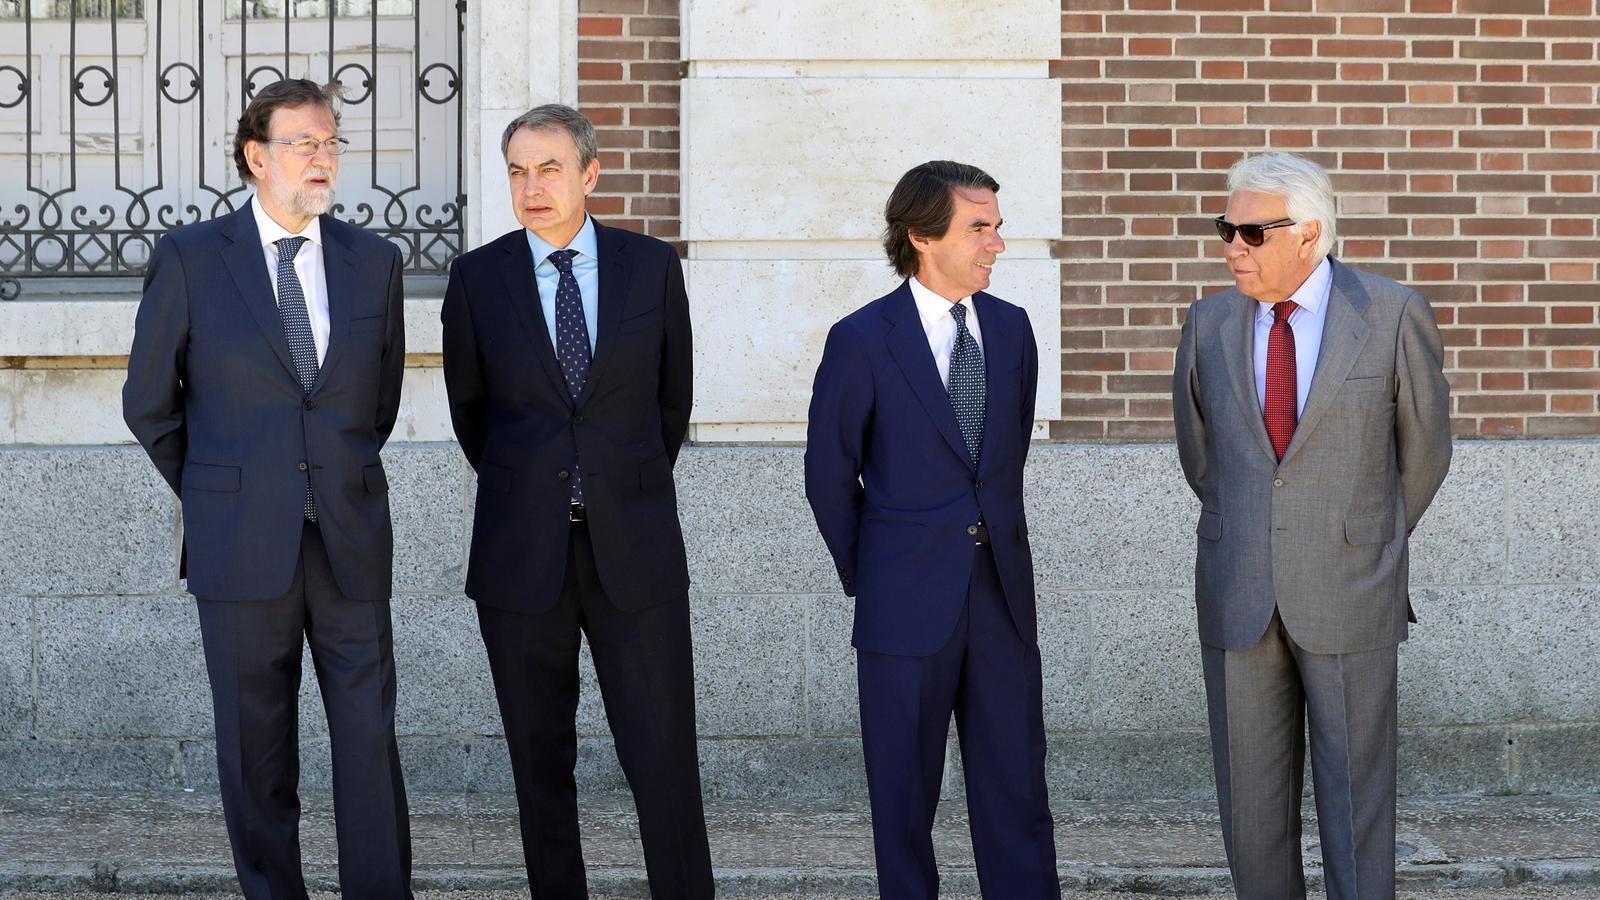 On són els papers dels expresidents espanyols?